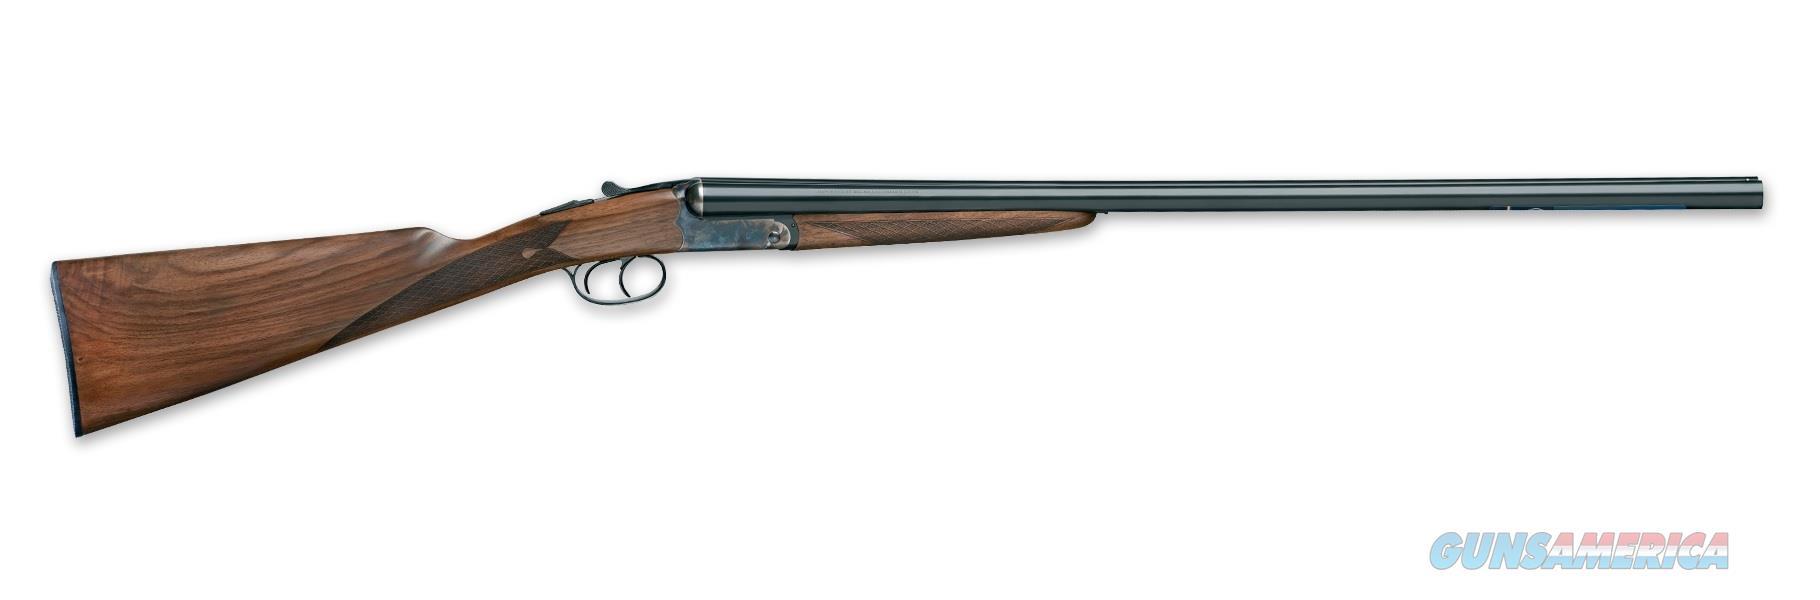 "Italian Firearms F.A.I.R. Iside SxS 20 Gauge 28"" 12015   Guns > Shotguns > Rizzini Shotguns"